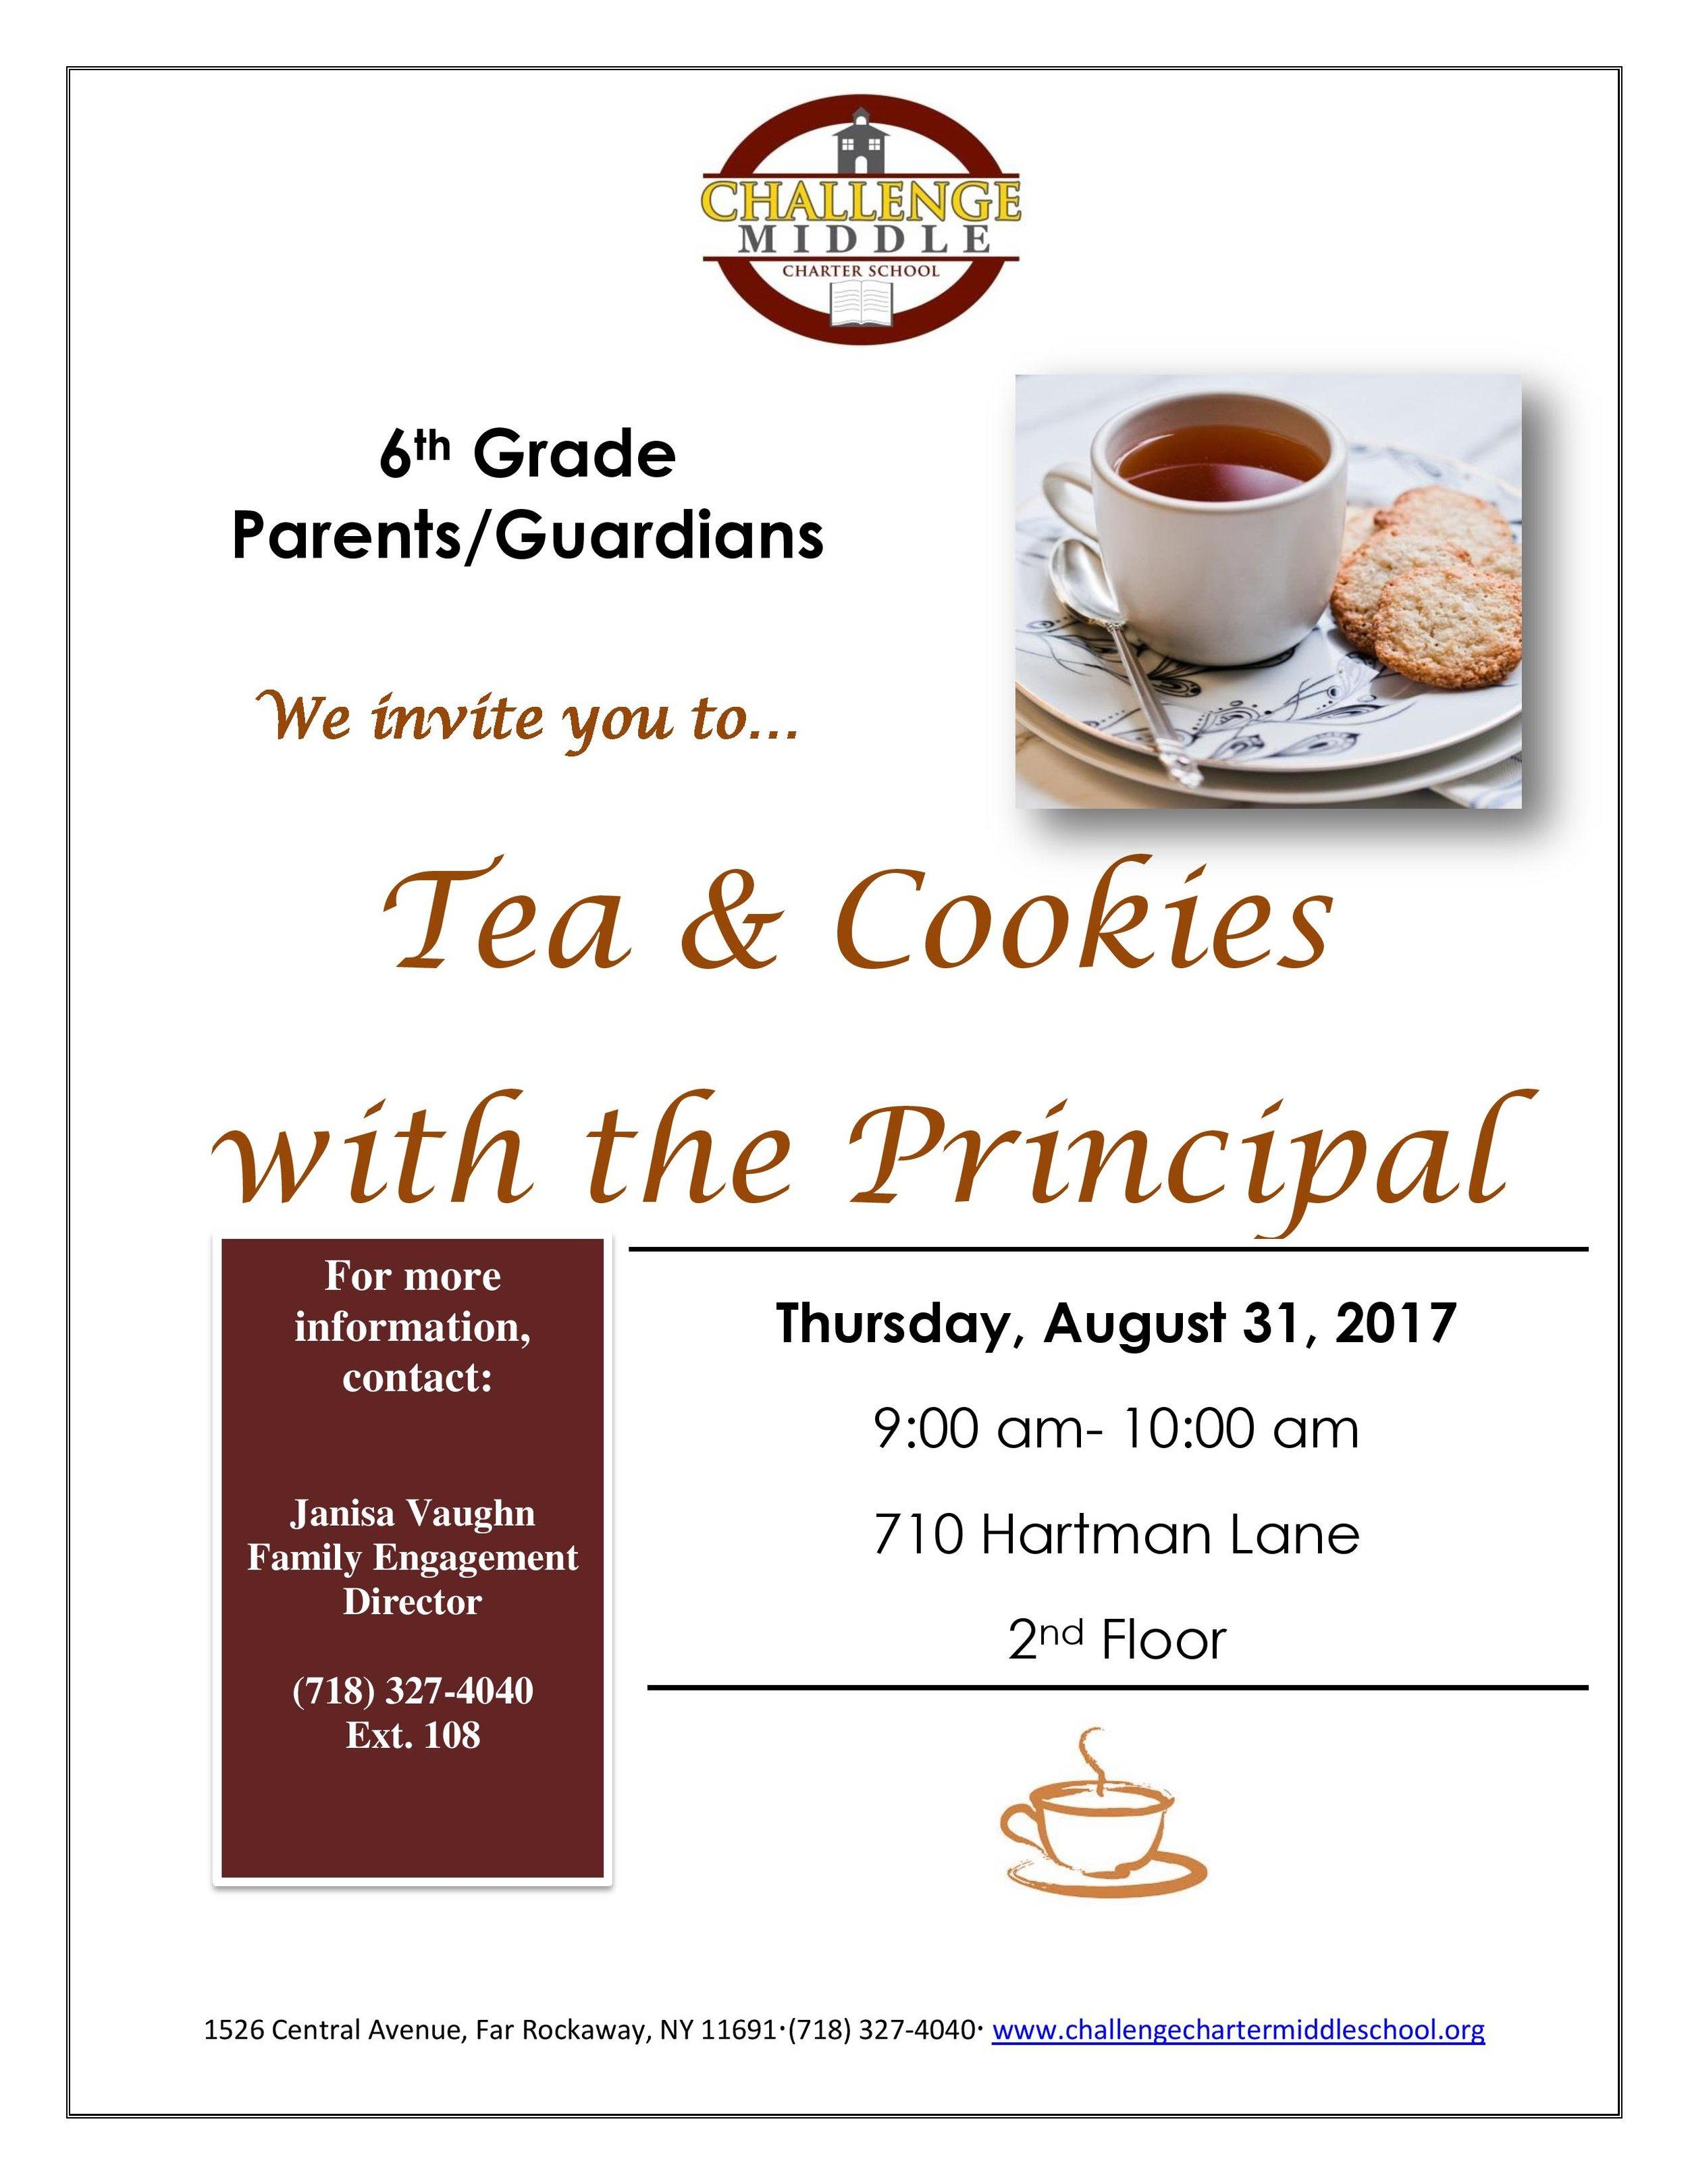 Meet the Principal flyer